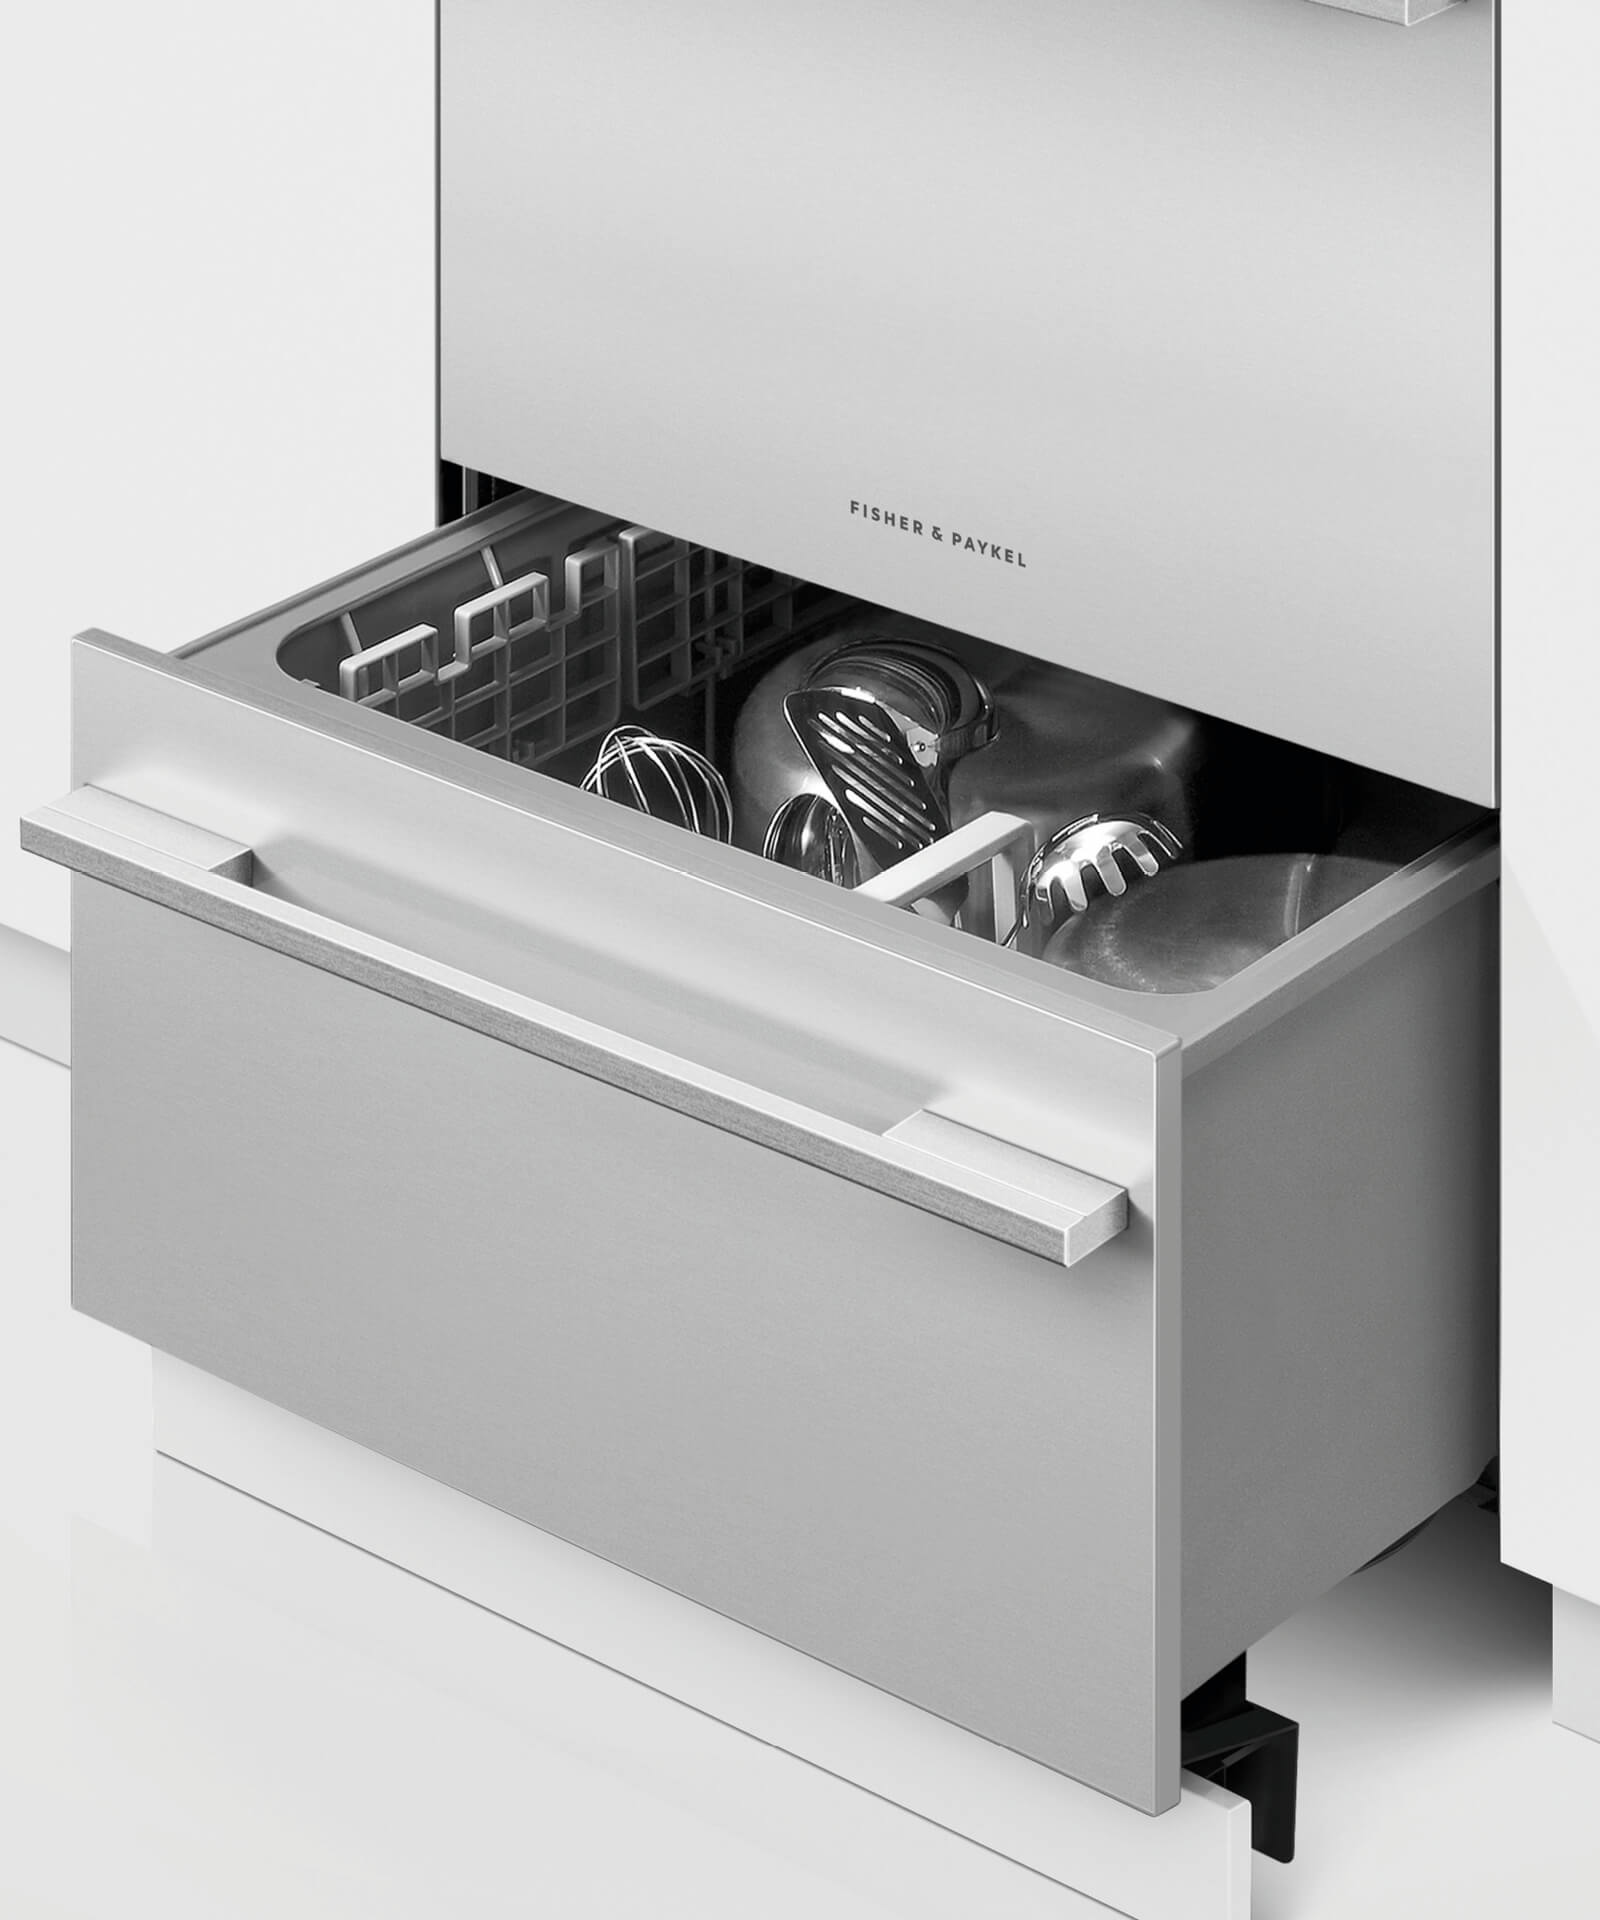 Dd24dhti9 N Panel Ready Tall Double Dishdrawer Dishwasher